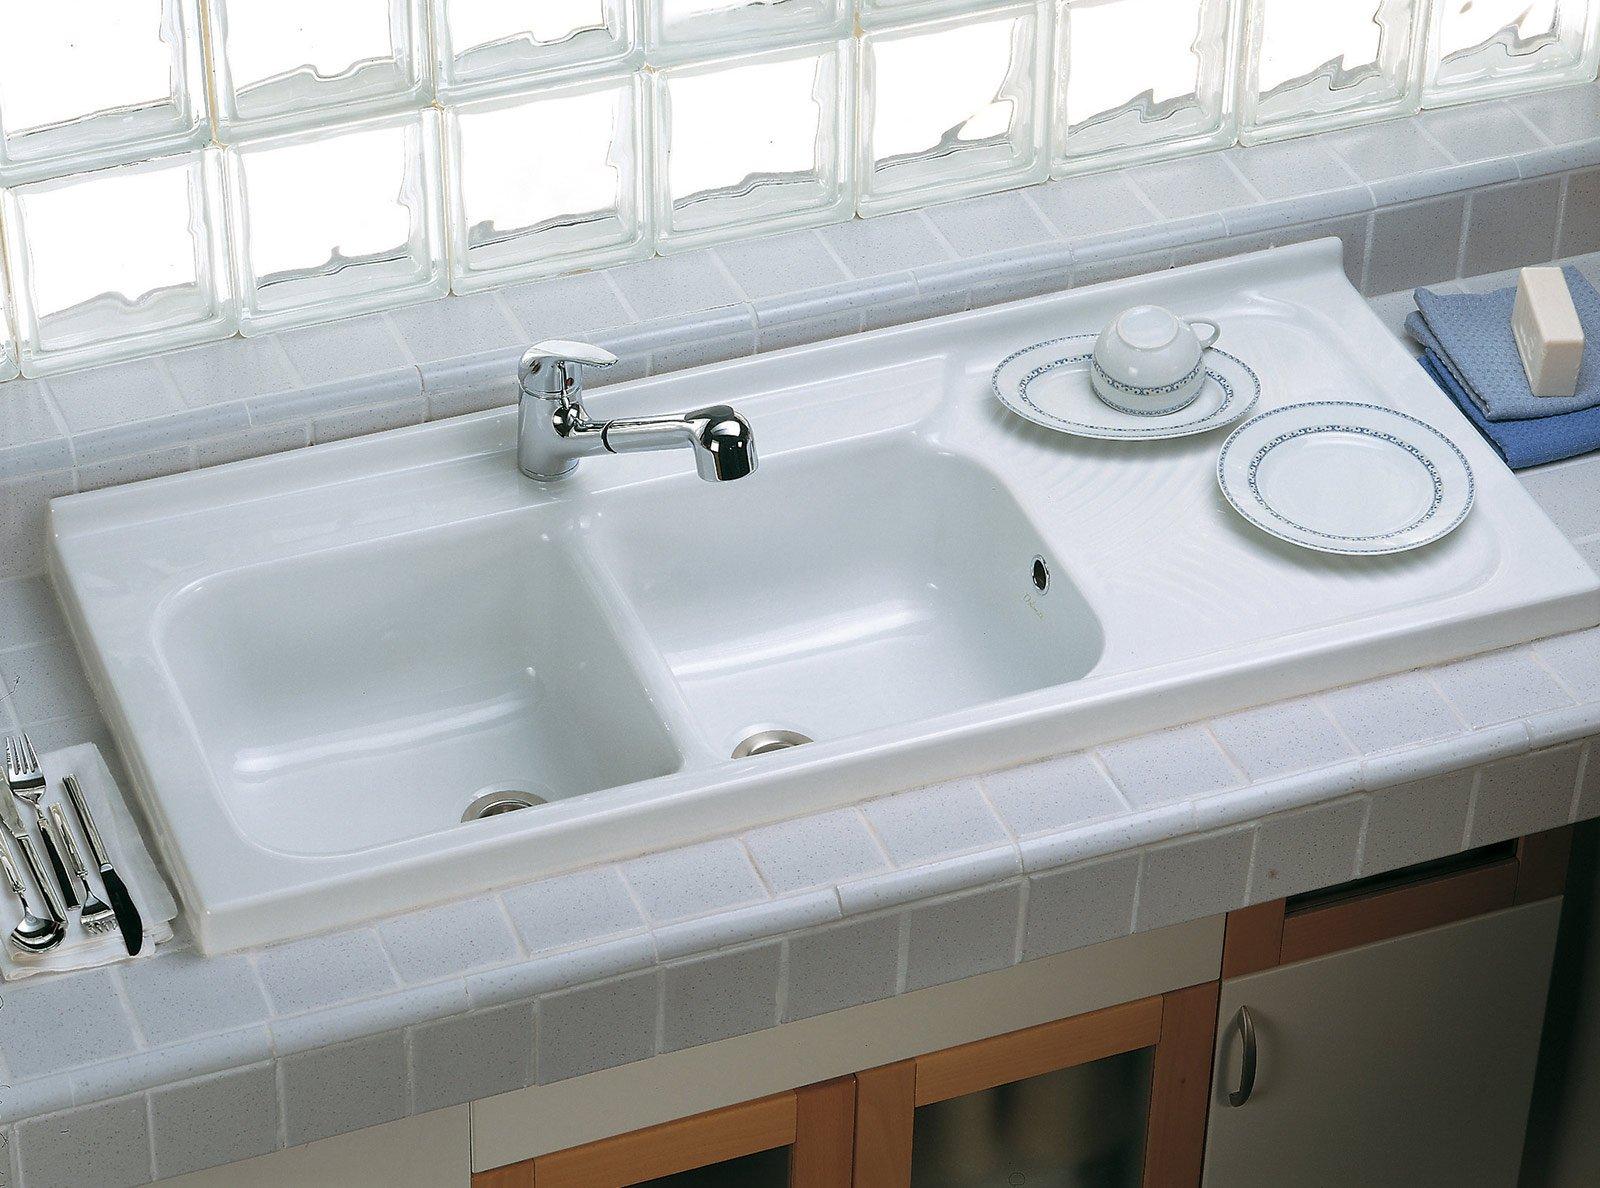 Lavelli cucina da incasso in ceramica termosifoni in - Foro areazione cucina ...